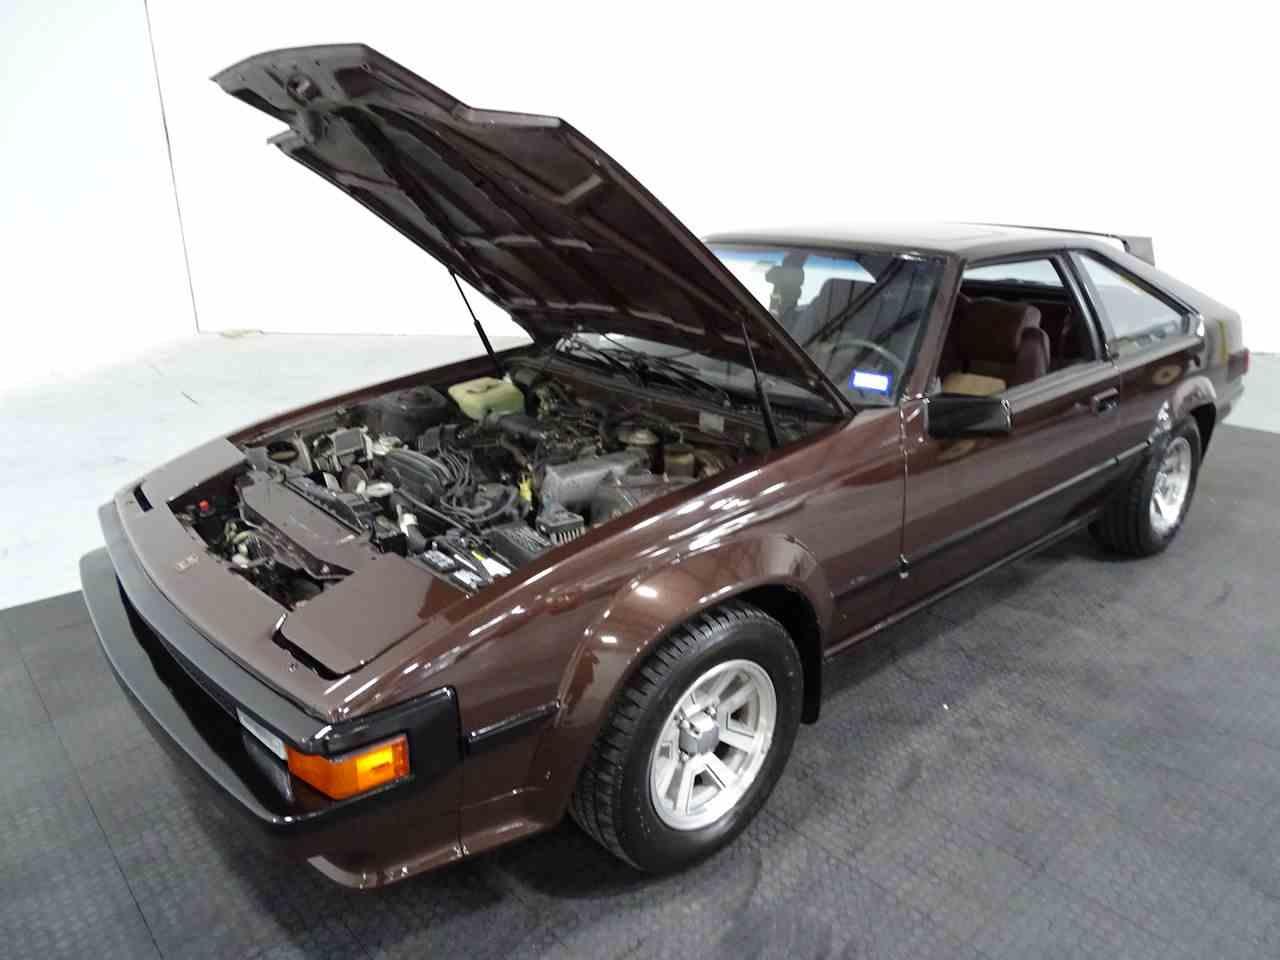 Houston Toyota Dealers >> 1984 Toyota Supra for Sale | ClassicCars.com | CC-1033622